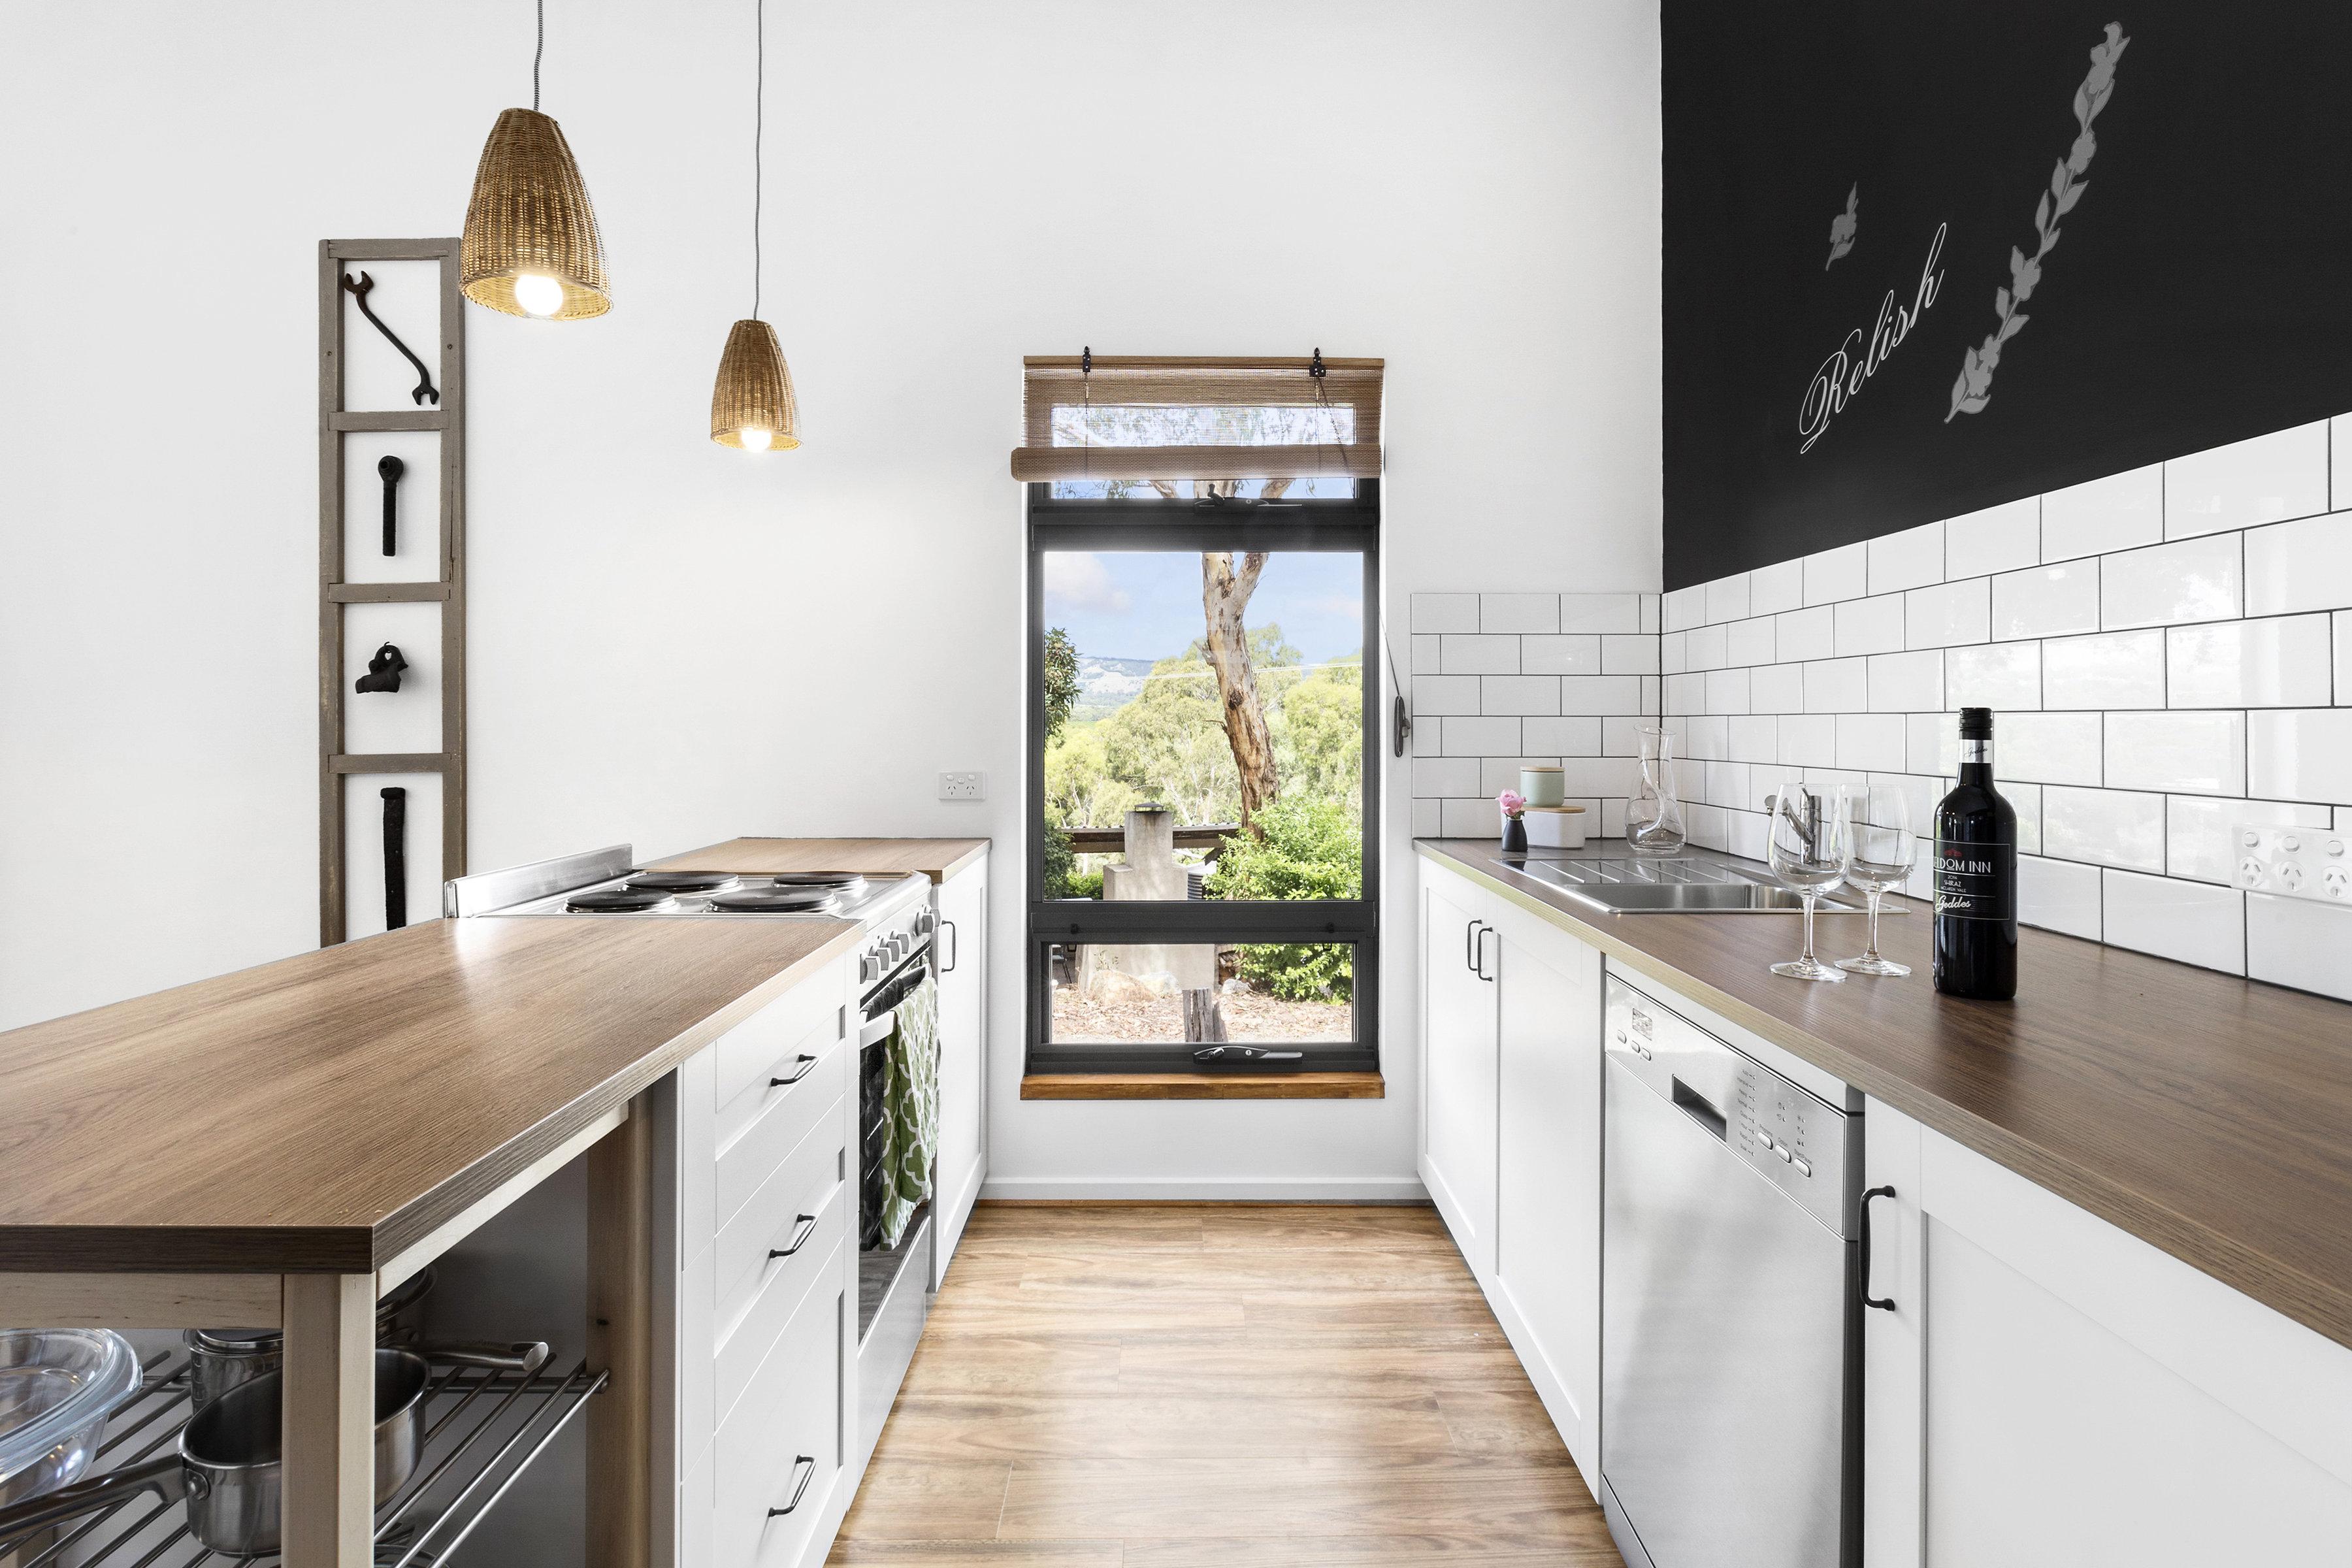 RELISH kitchen